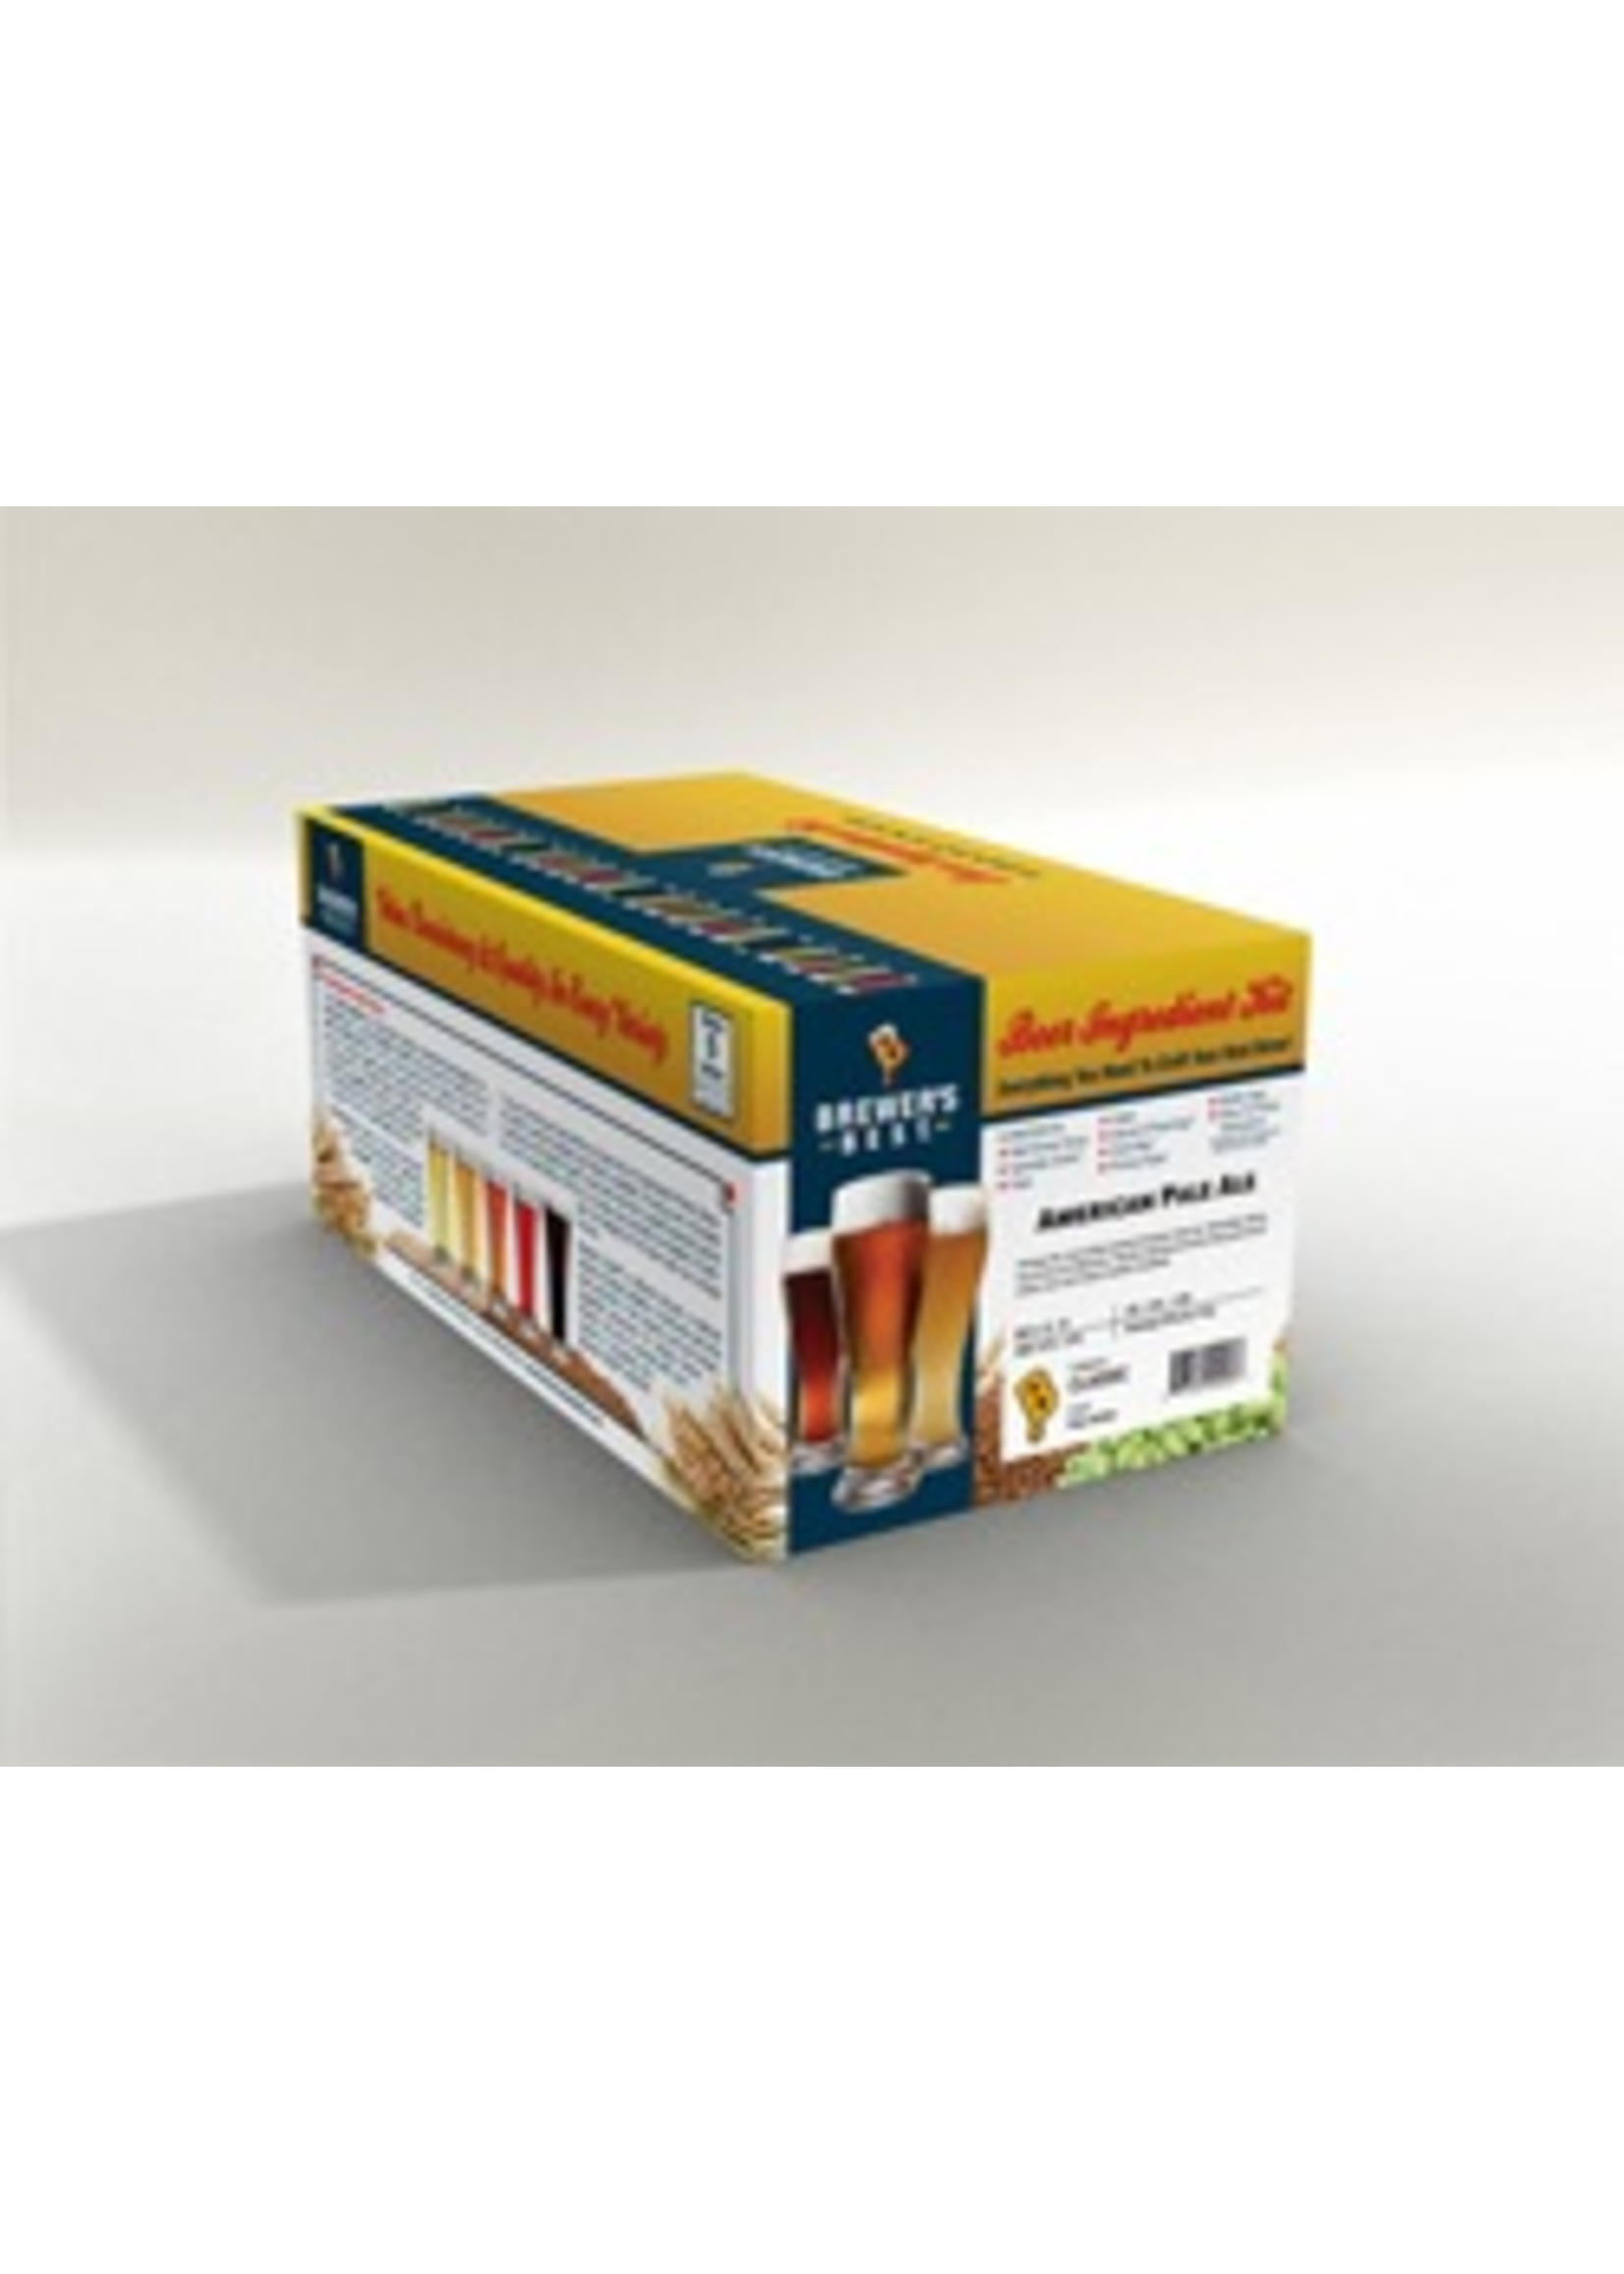 Ingredient Kits Brewer's Best Robust Porter - 5 Gallon Beer Ingredient Kit